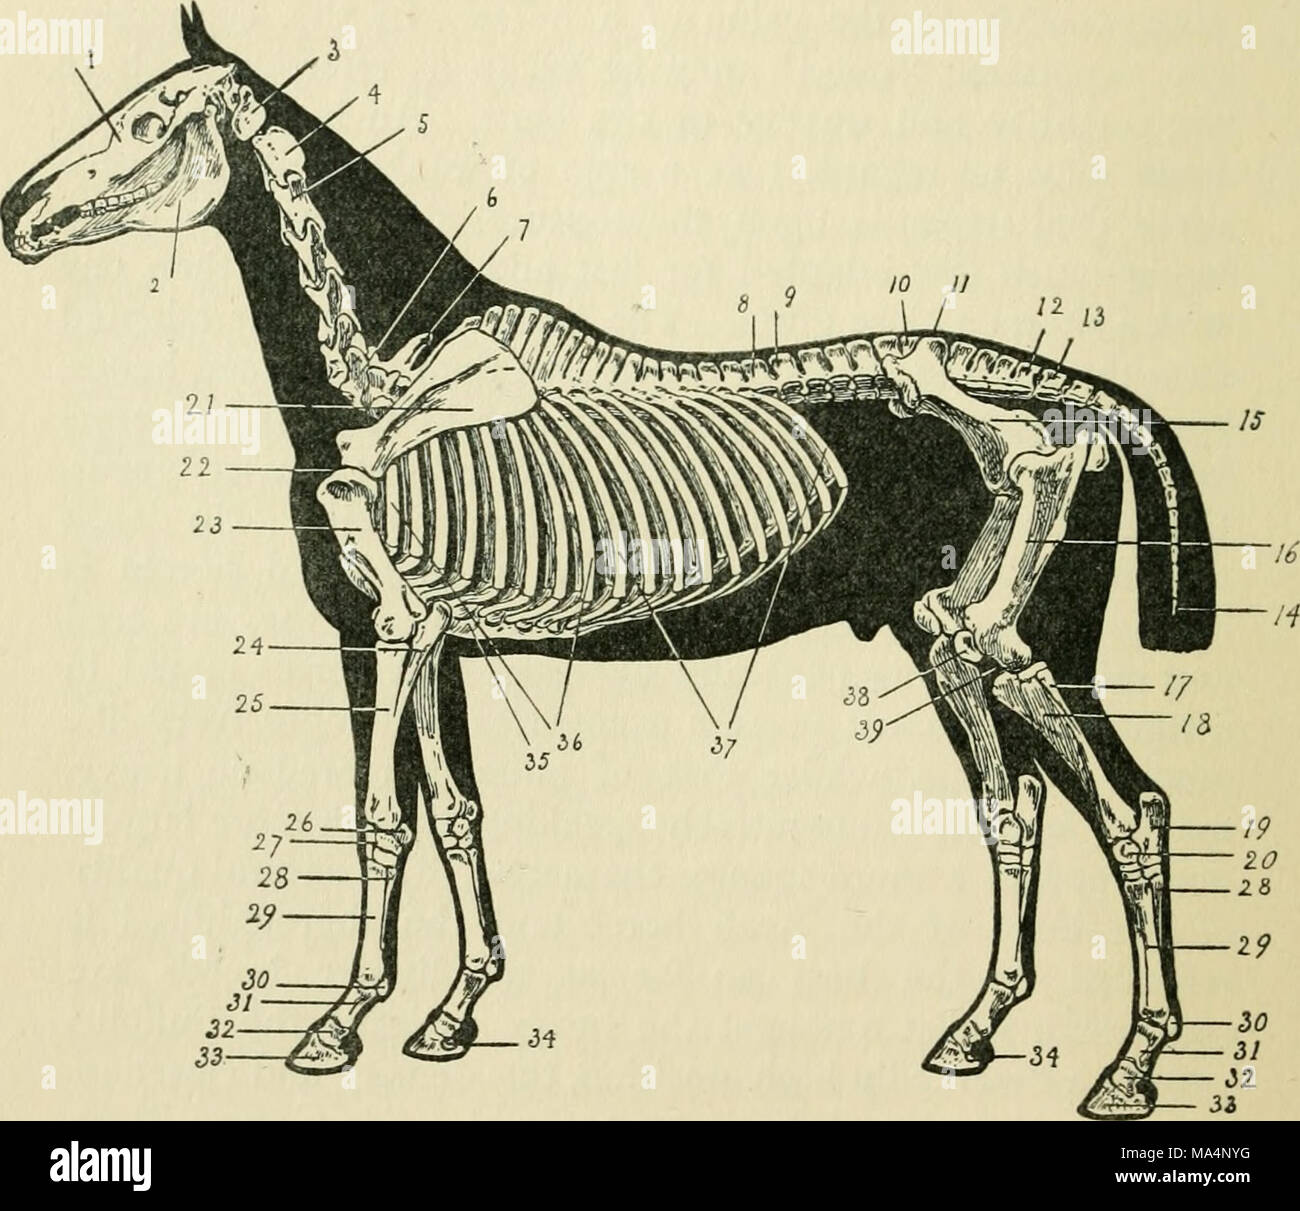 Hermosa Horse Hoof Anatomy And Physiology Bandera - Anatomía y ...